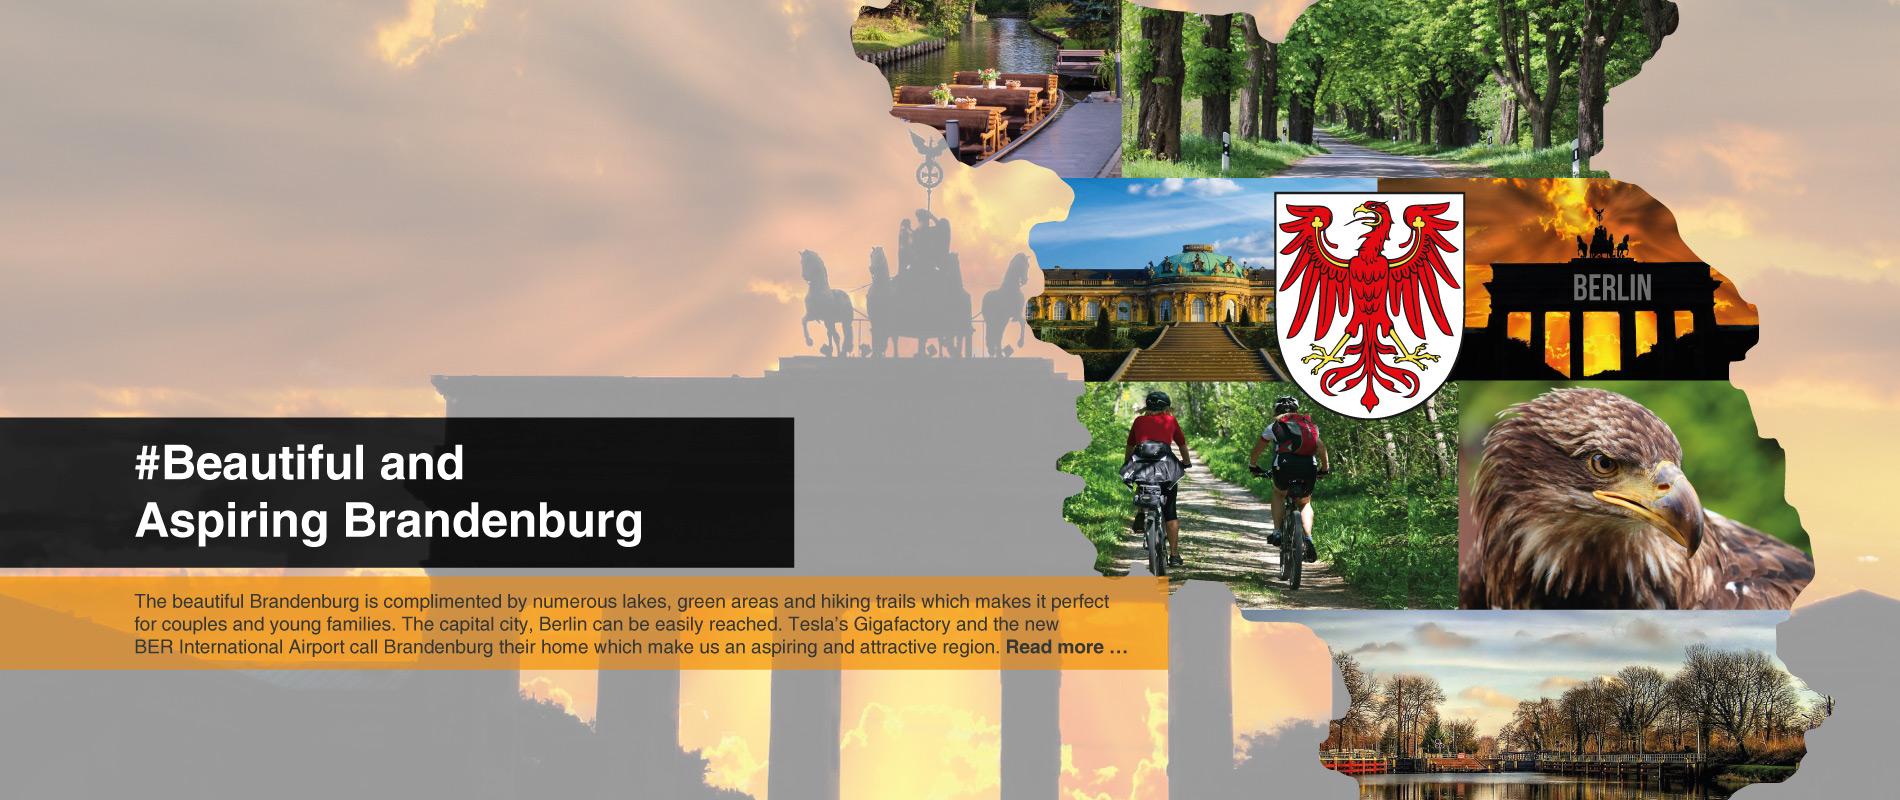 Beautiful and Aspiring Brandenburg